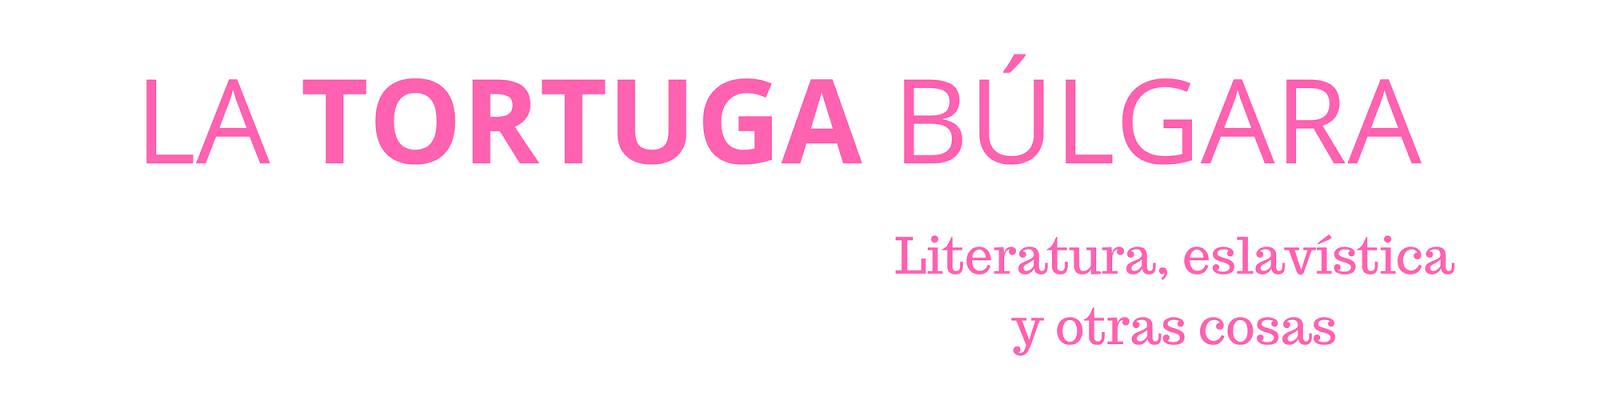 LA TORTUGA BÚLGARA